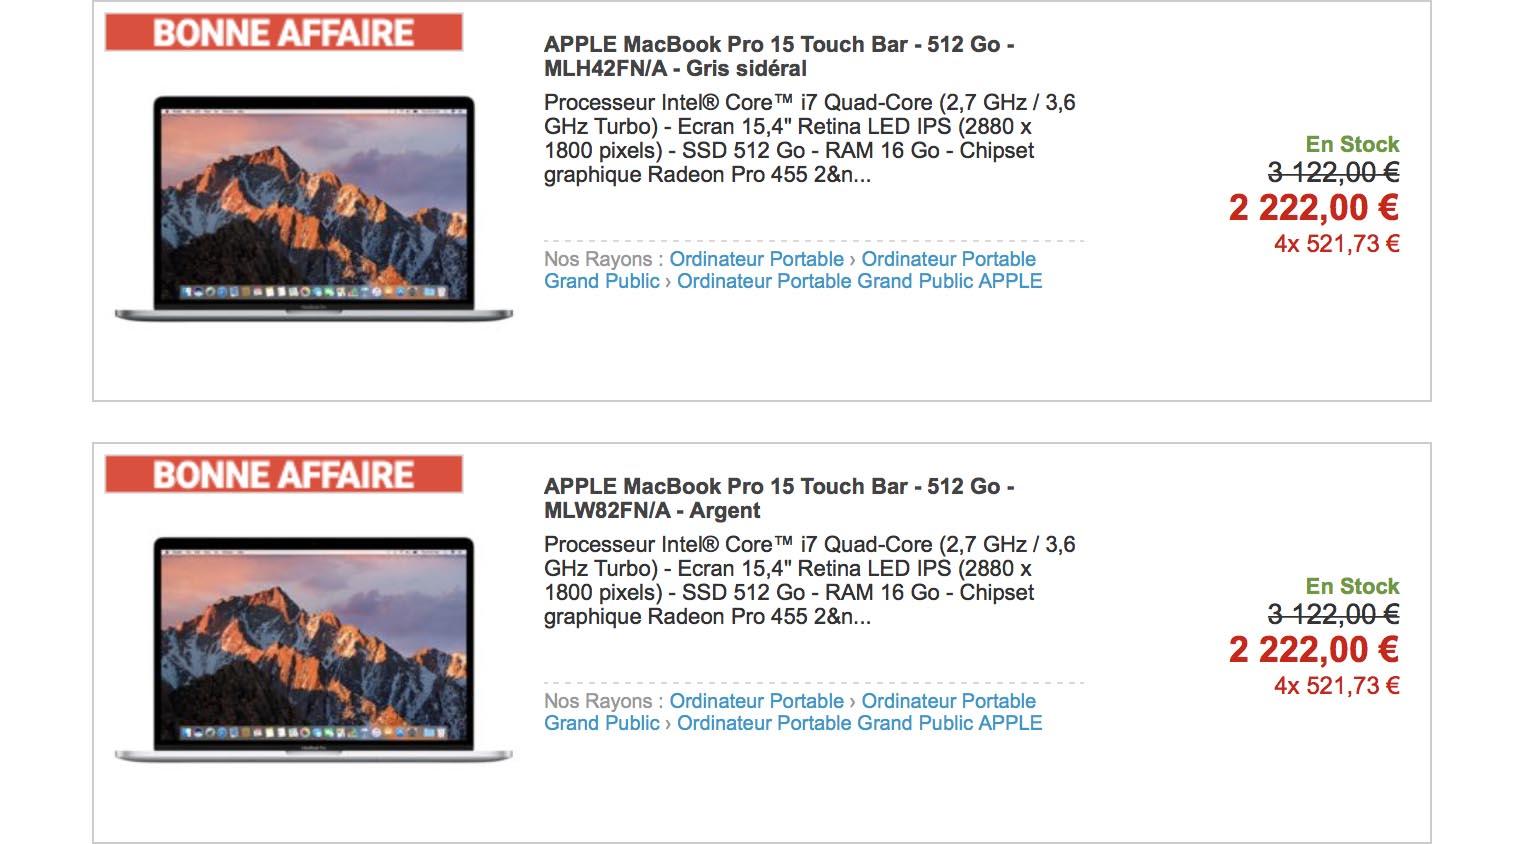 MacBook Pro Rue du Commerce promo